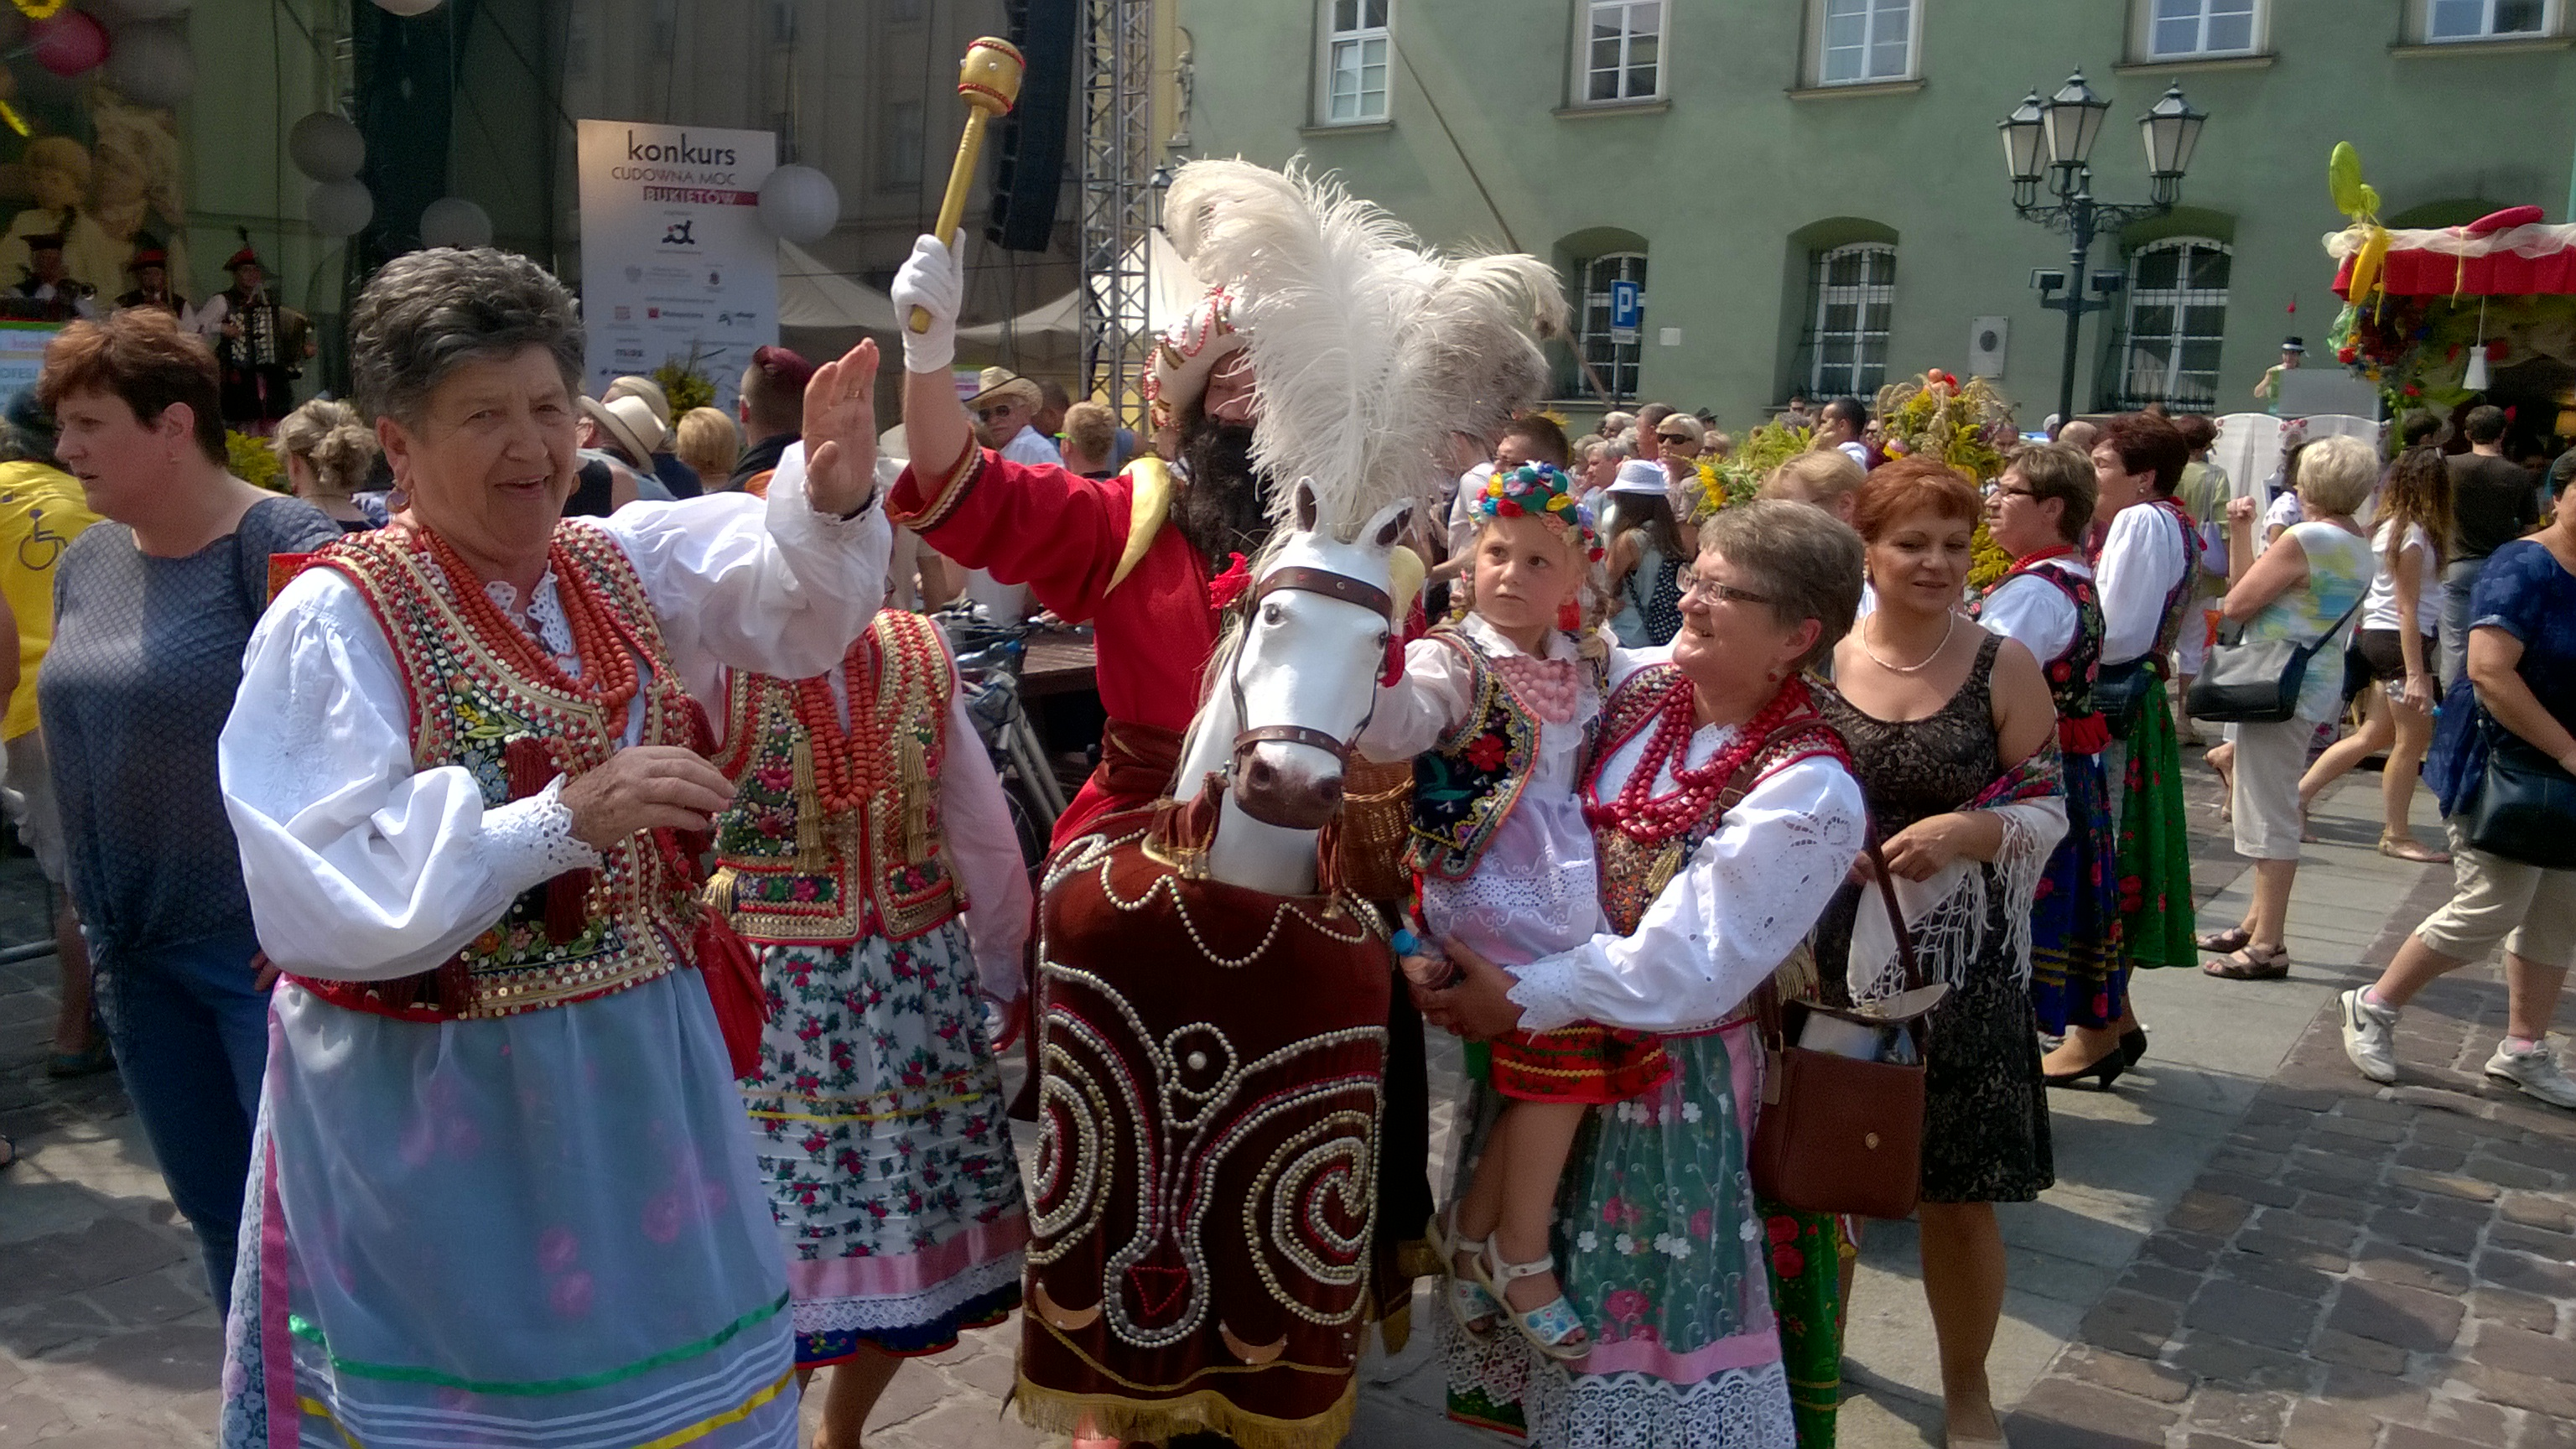 15.08.2015 Konkurs w Zielonkach (119)